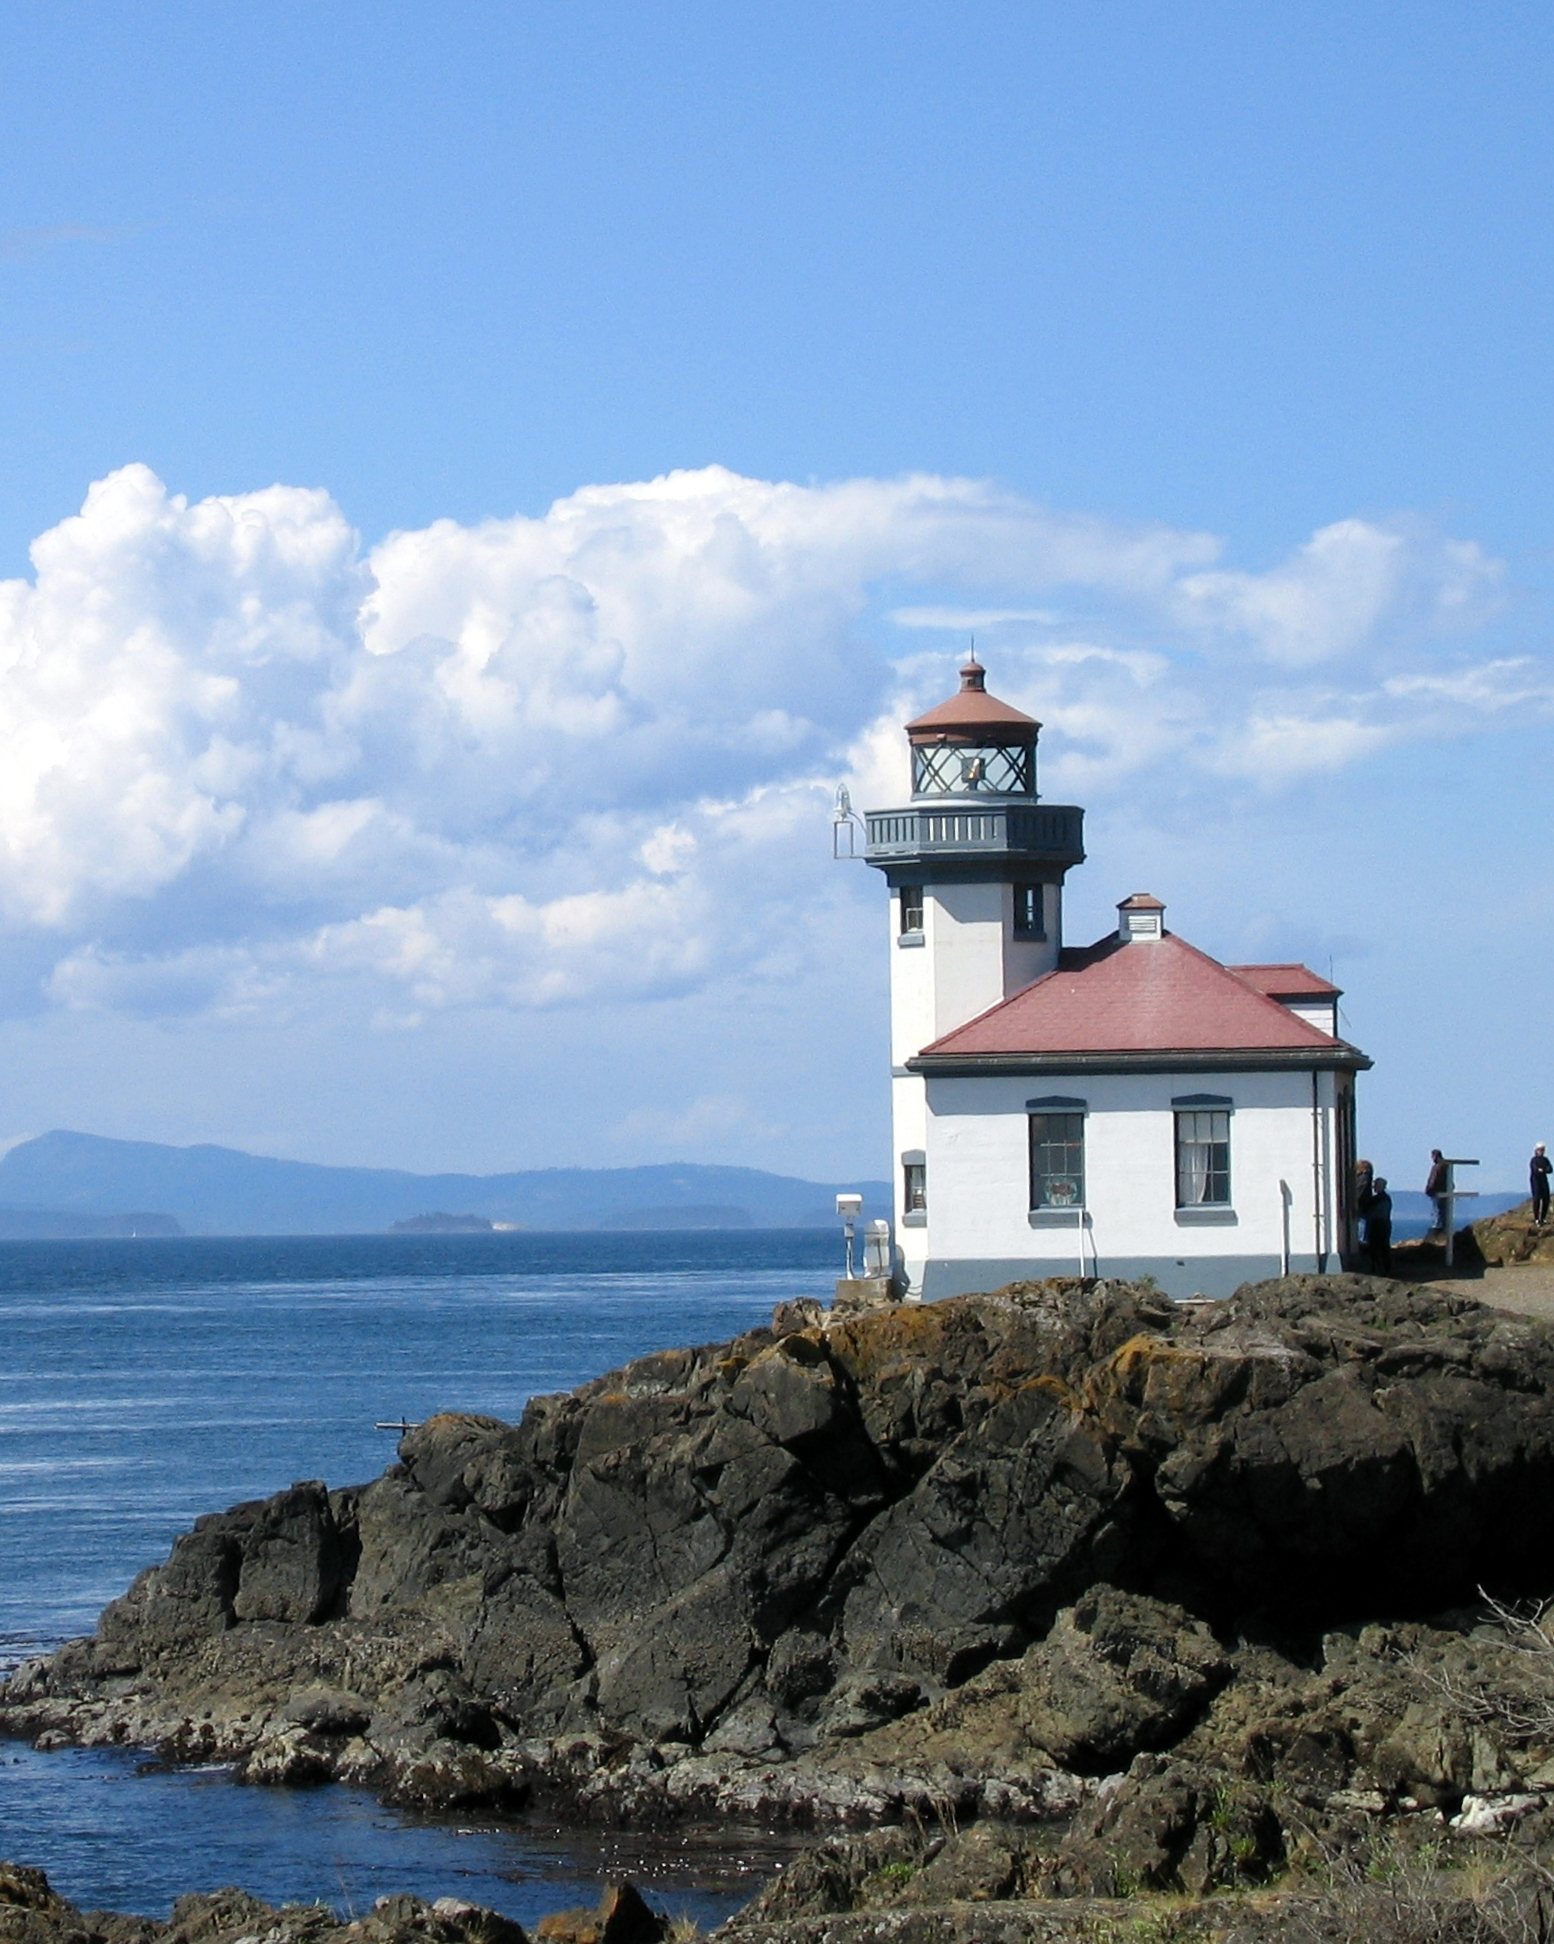 us-islands-san-juan-islands-lime-kiln-lighthouse-1115.jpg